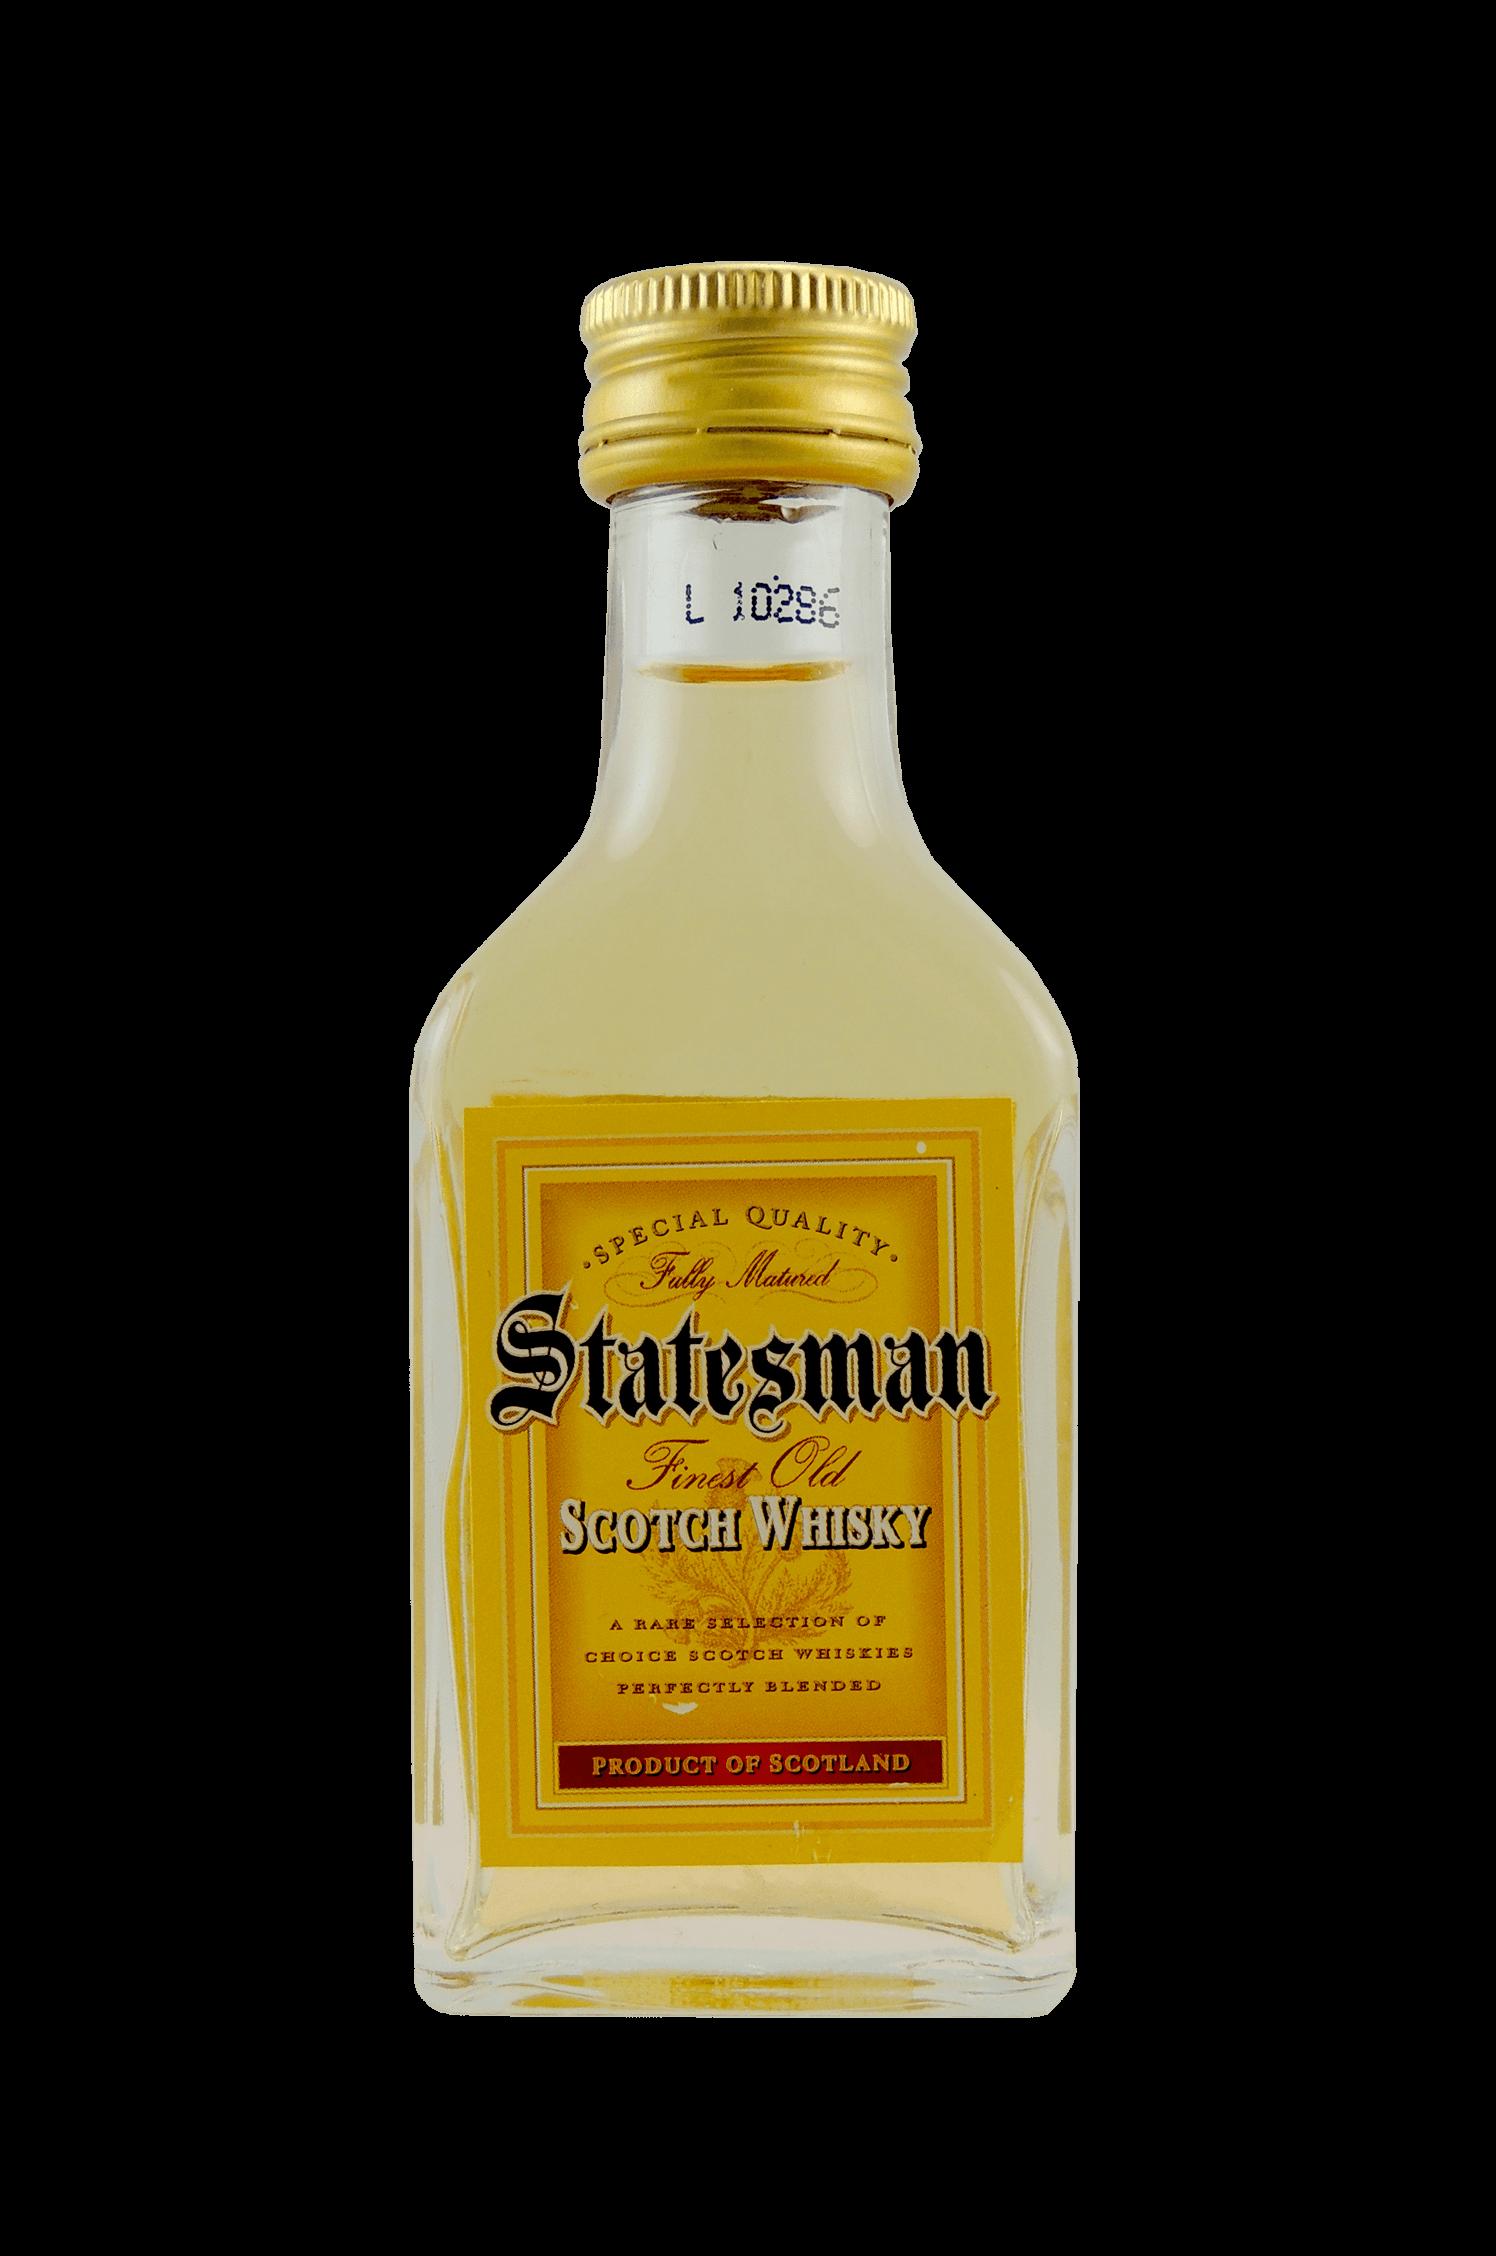 Statesman Scotch Whisky